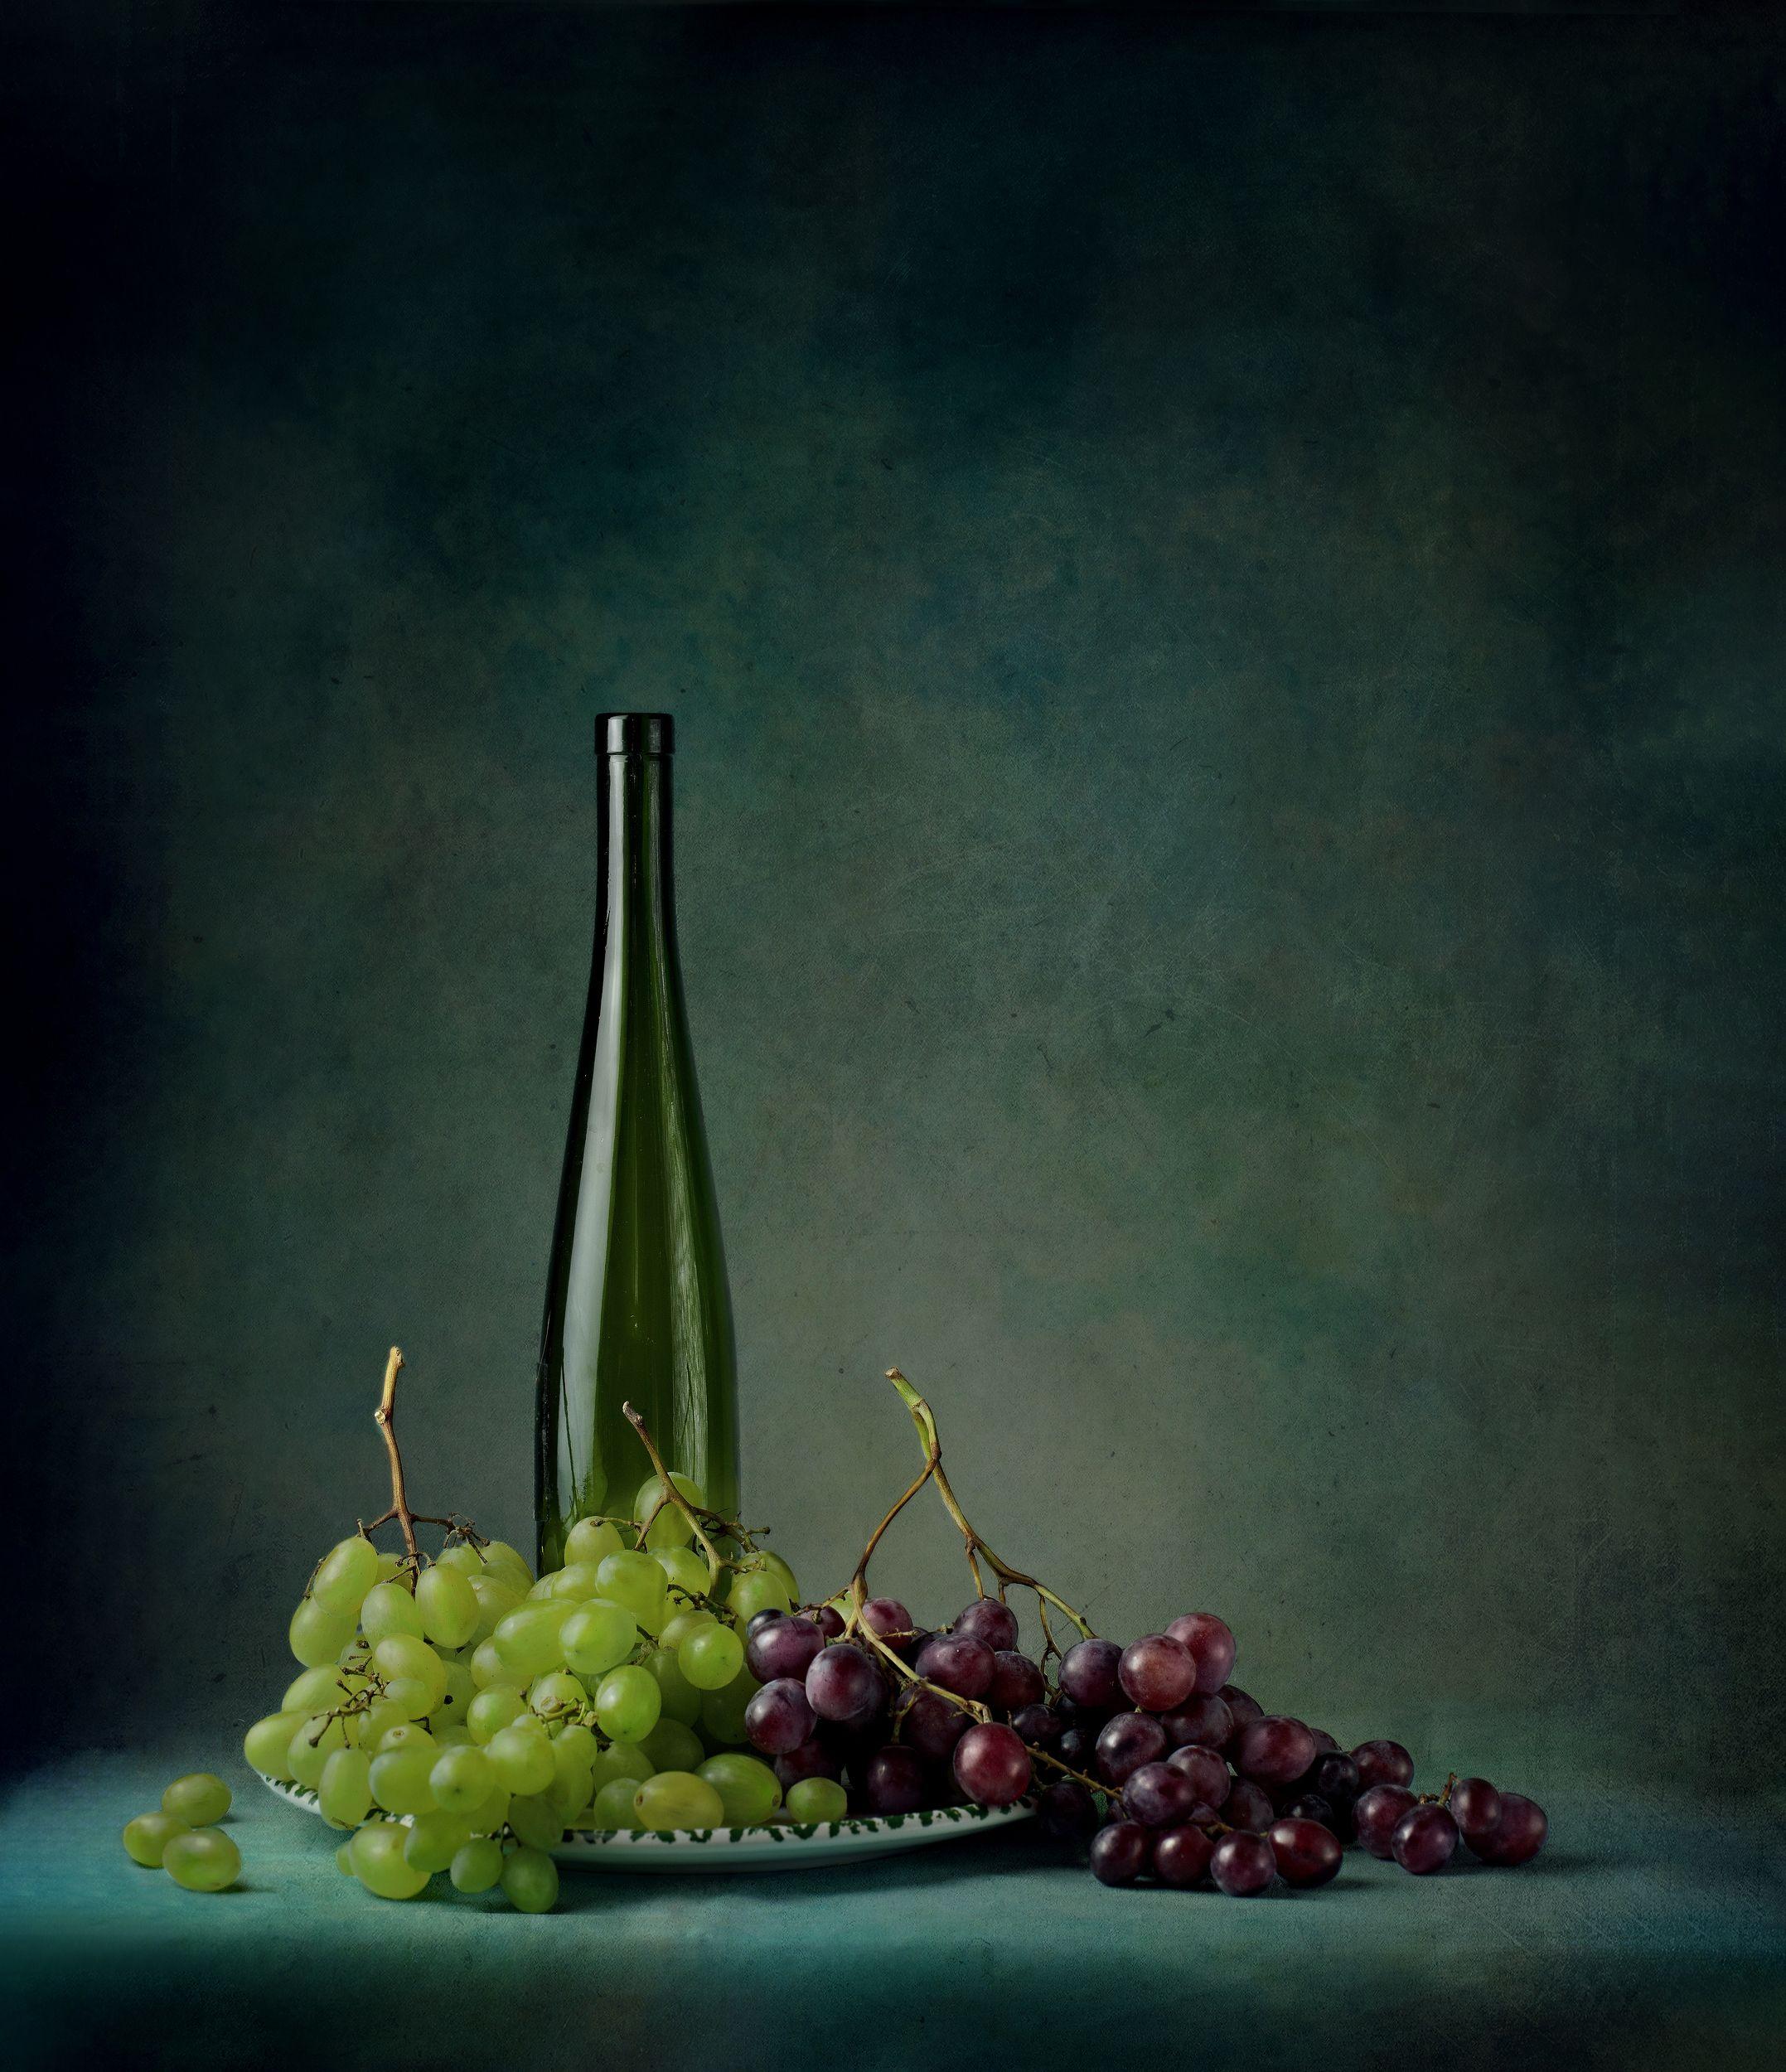 still life with berries, still life, berries, grapes, table, elegance, drink, alcohol, bottle, object, fruit, decoration, table, home, arts, modern world, society, fine art, food, vegetarian, dessert, Костин Анжелика